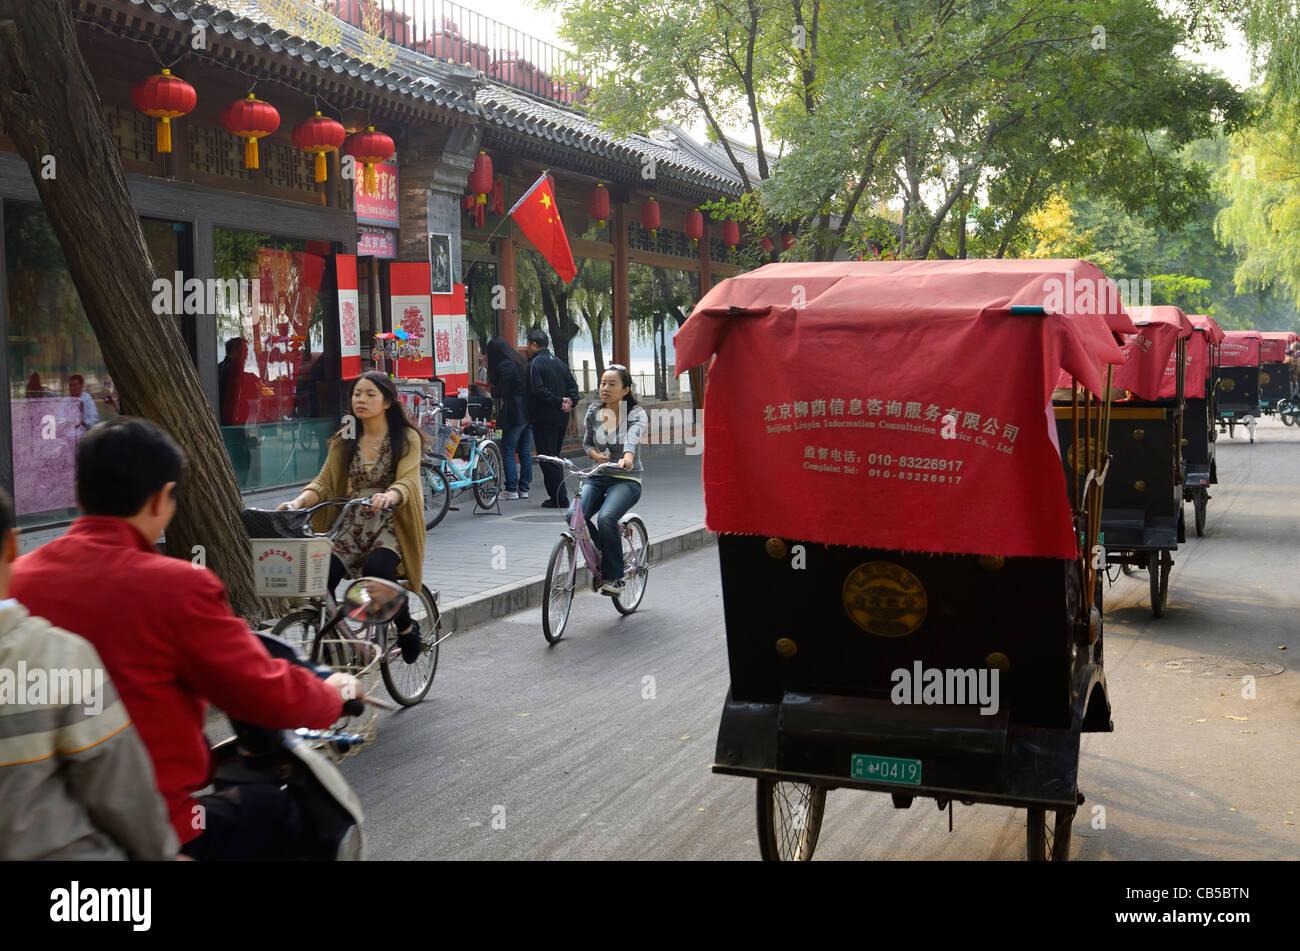 Traffic and line of pedicabs on Qianhai Beiyan street in Shichahai area at Qianhai lake Beijing Peoples Republic - Stock Image